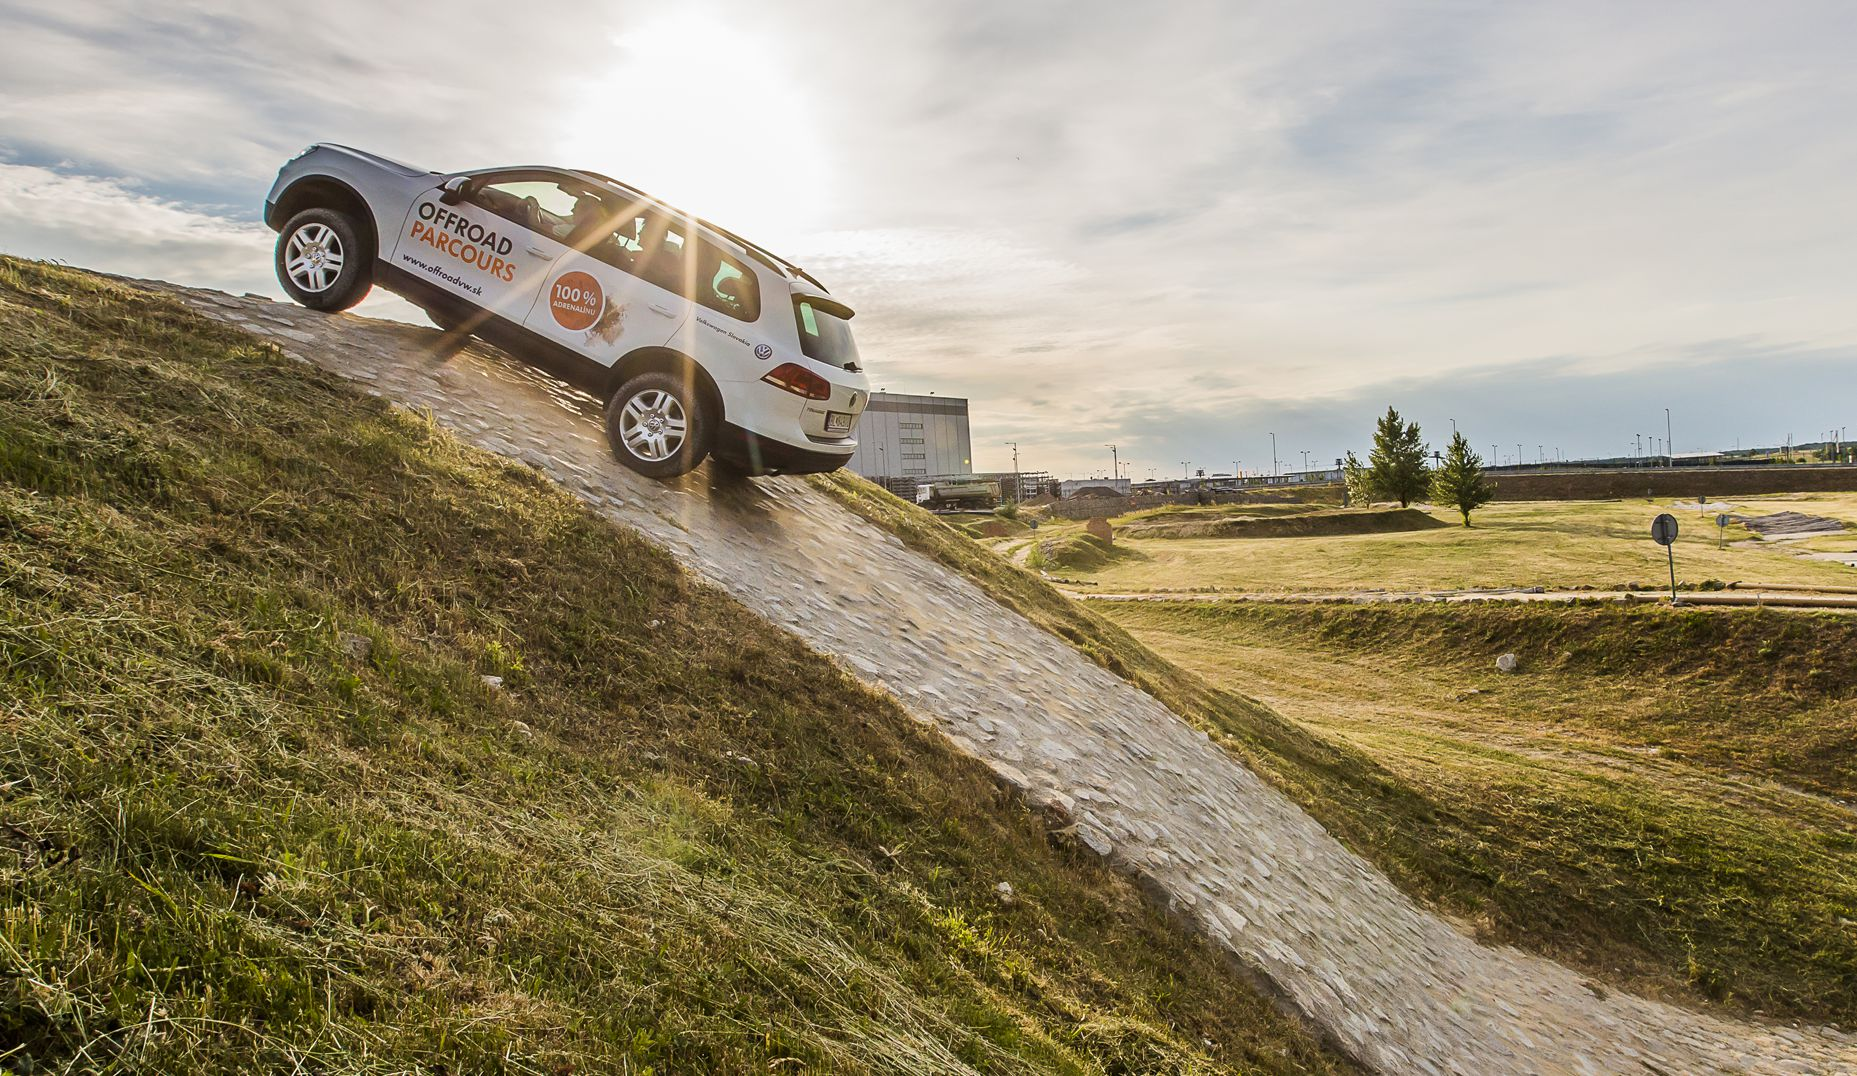 Offroad Parcours - Erlebnisfahrt Volkswagen Slovakia